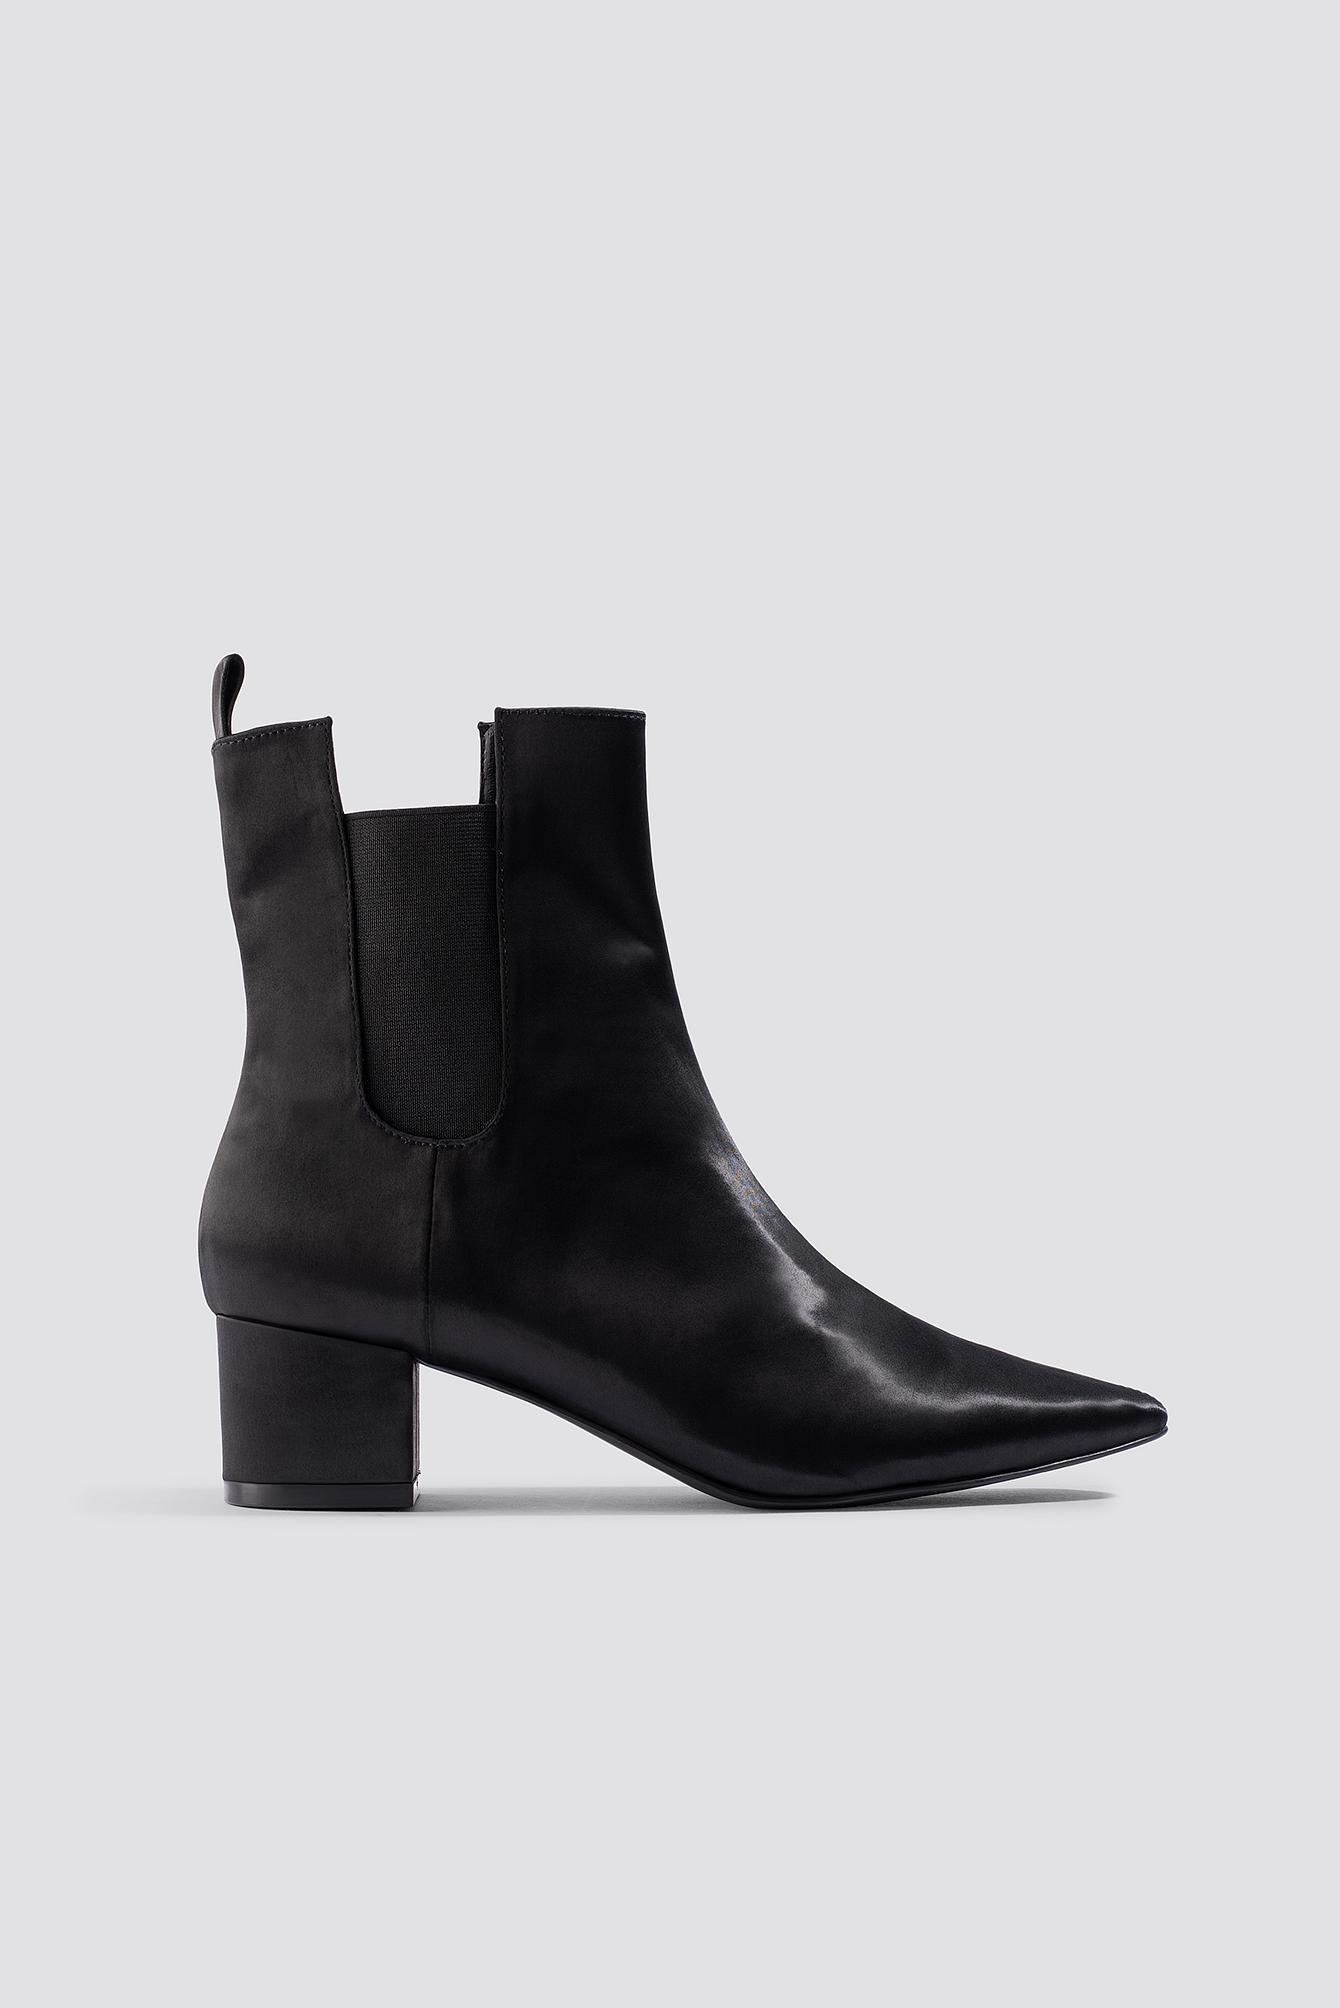 emilie briting x na-kd -  Satin Ankle Boots - Black